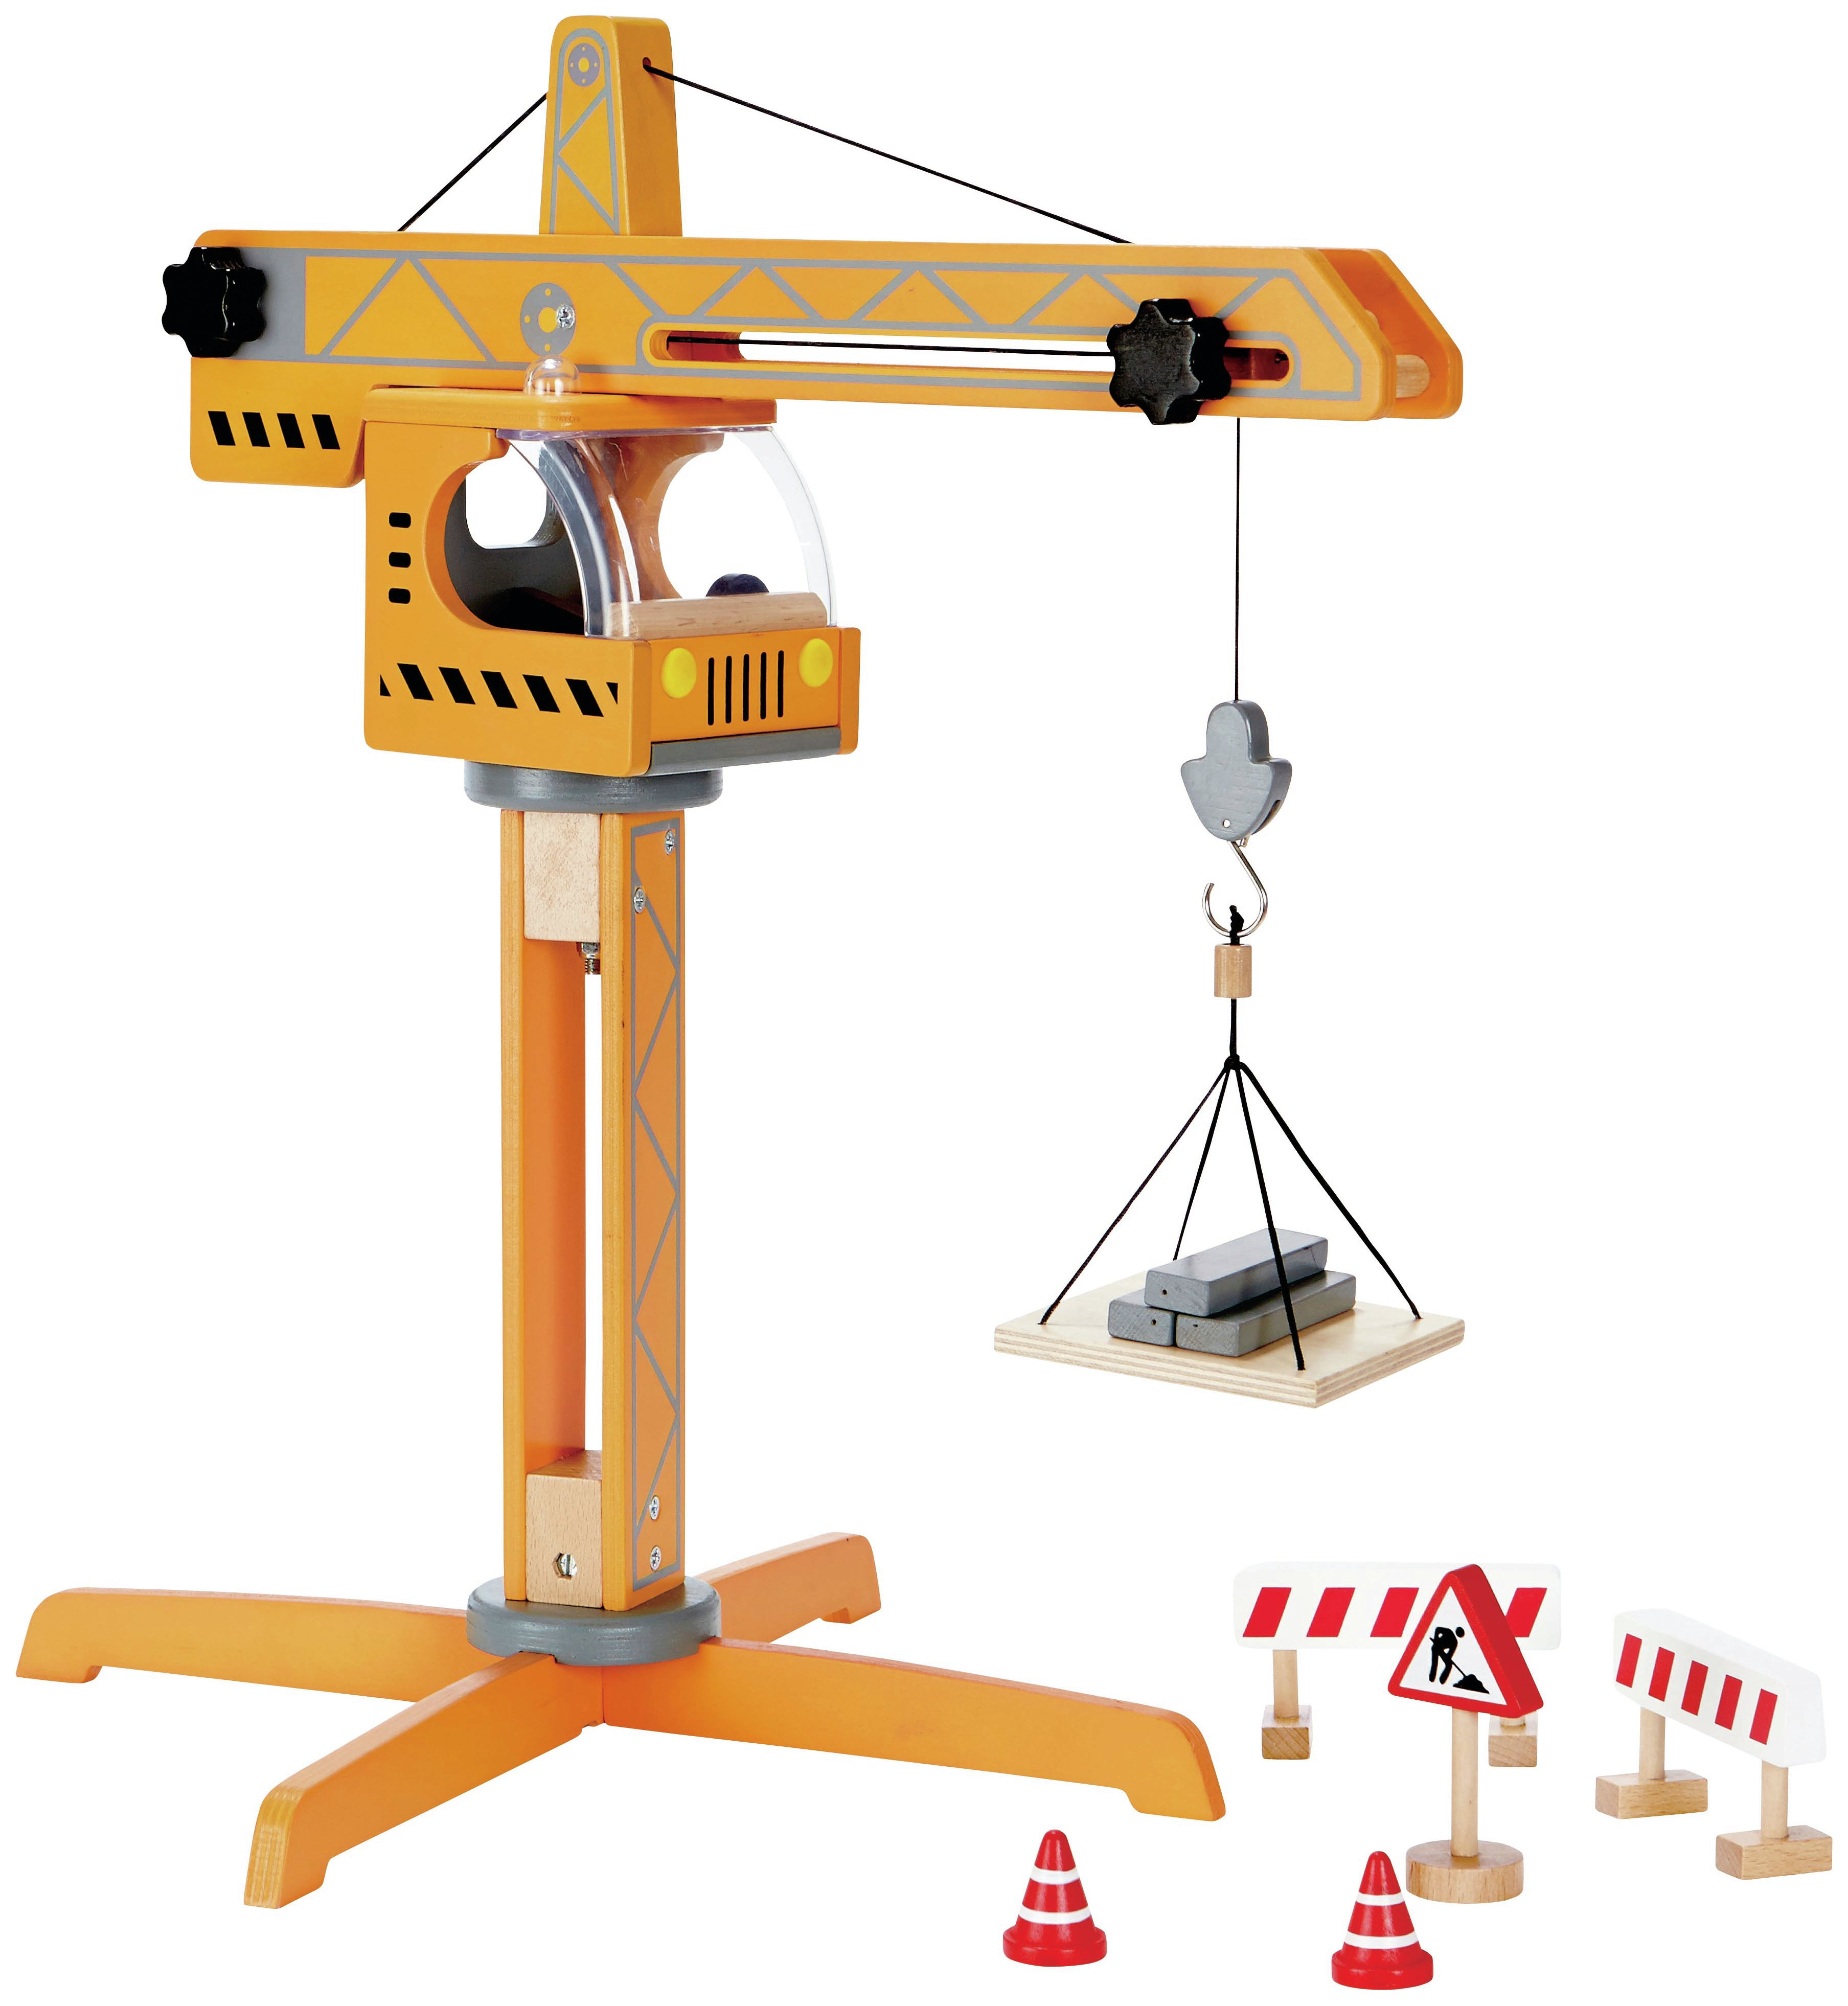 Image of Hape Crane Lift Playset.